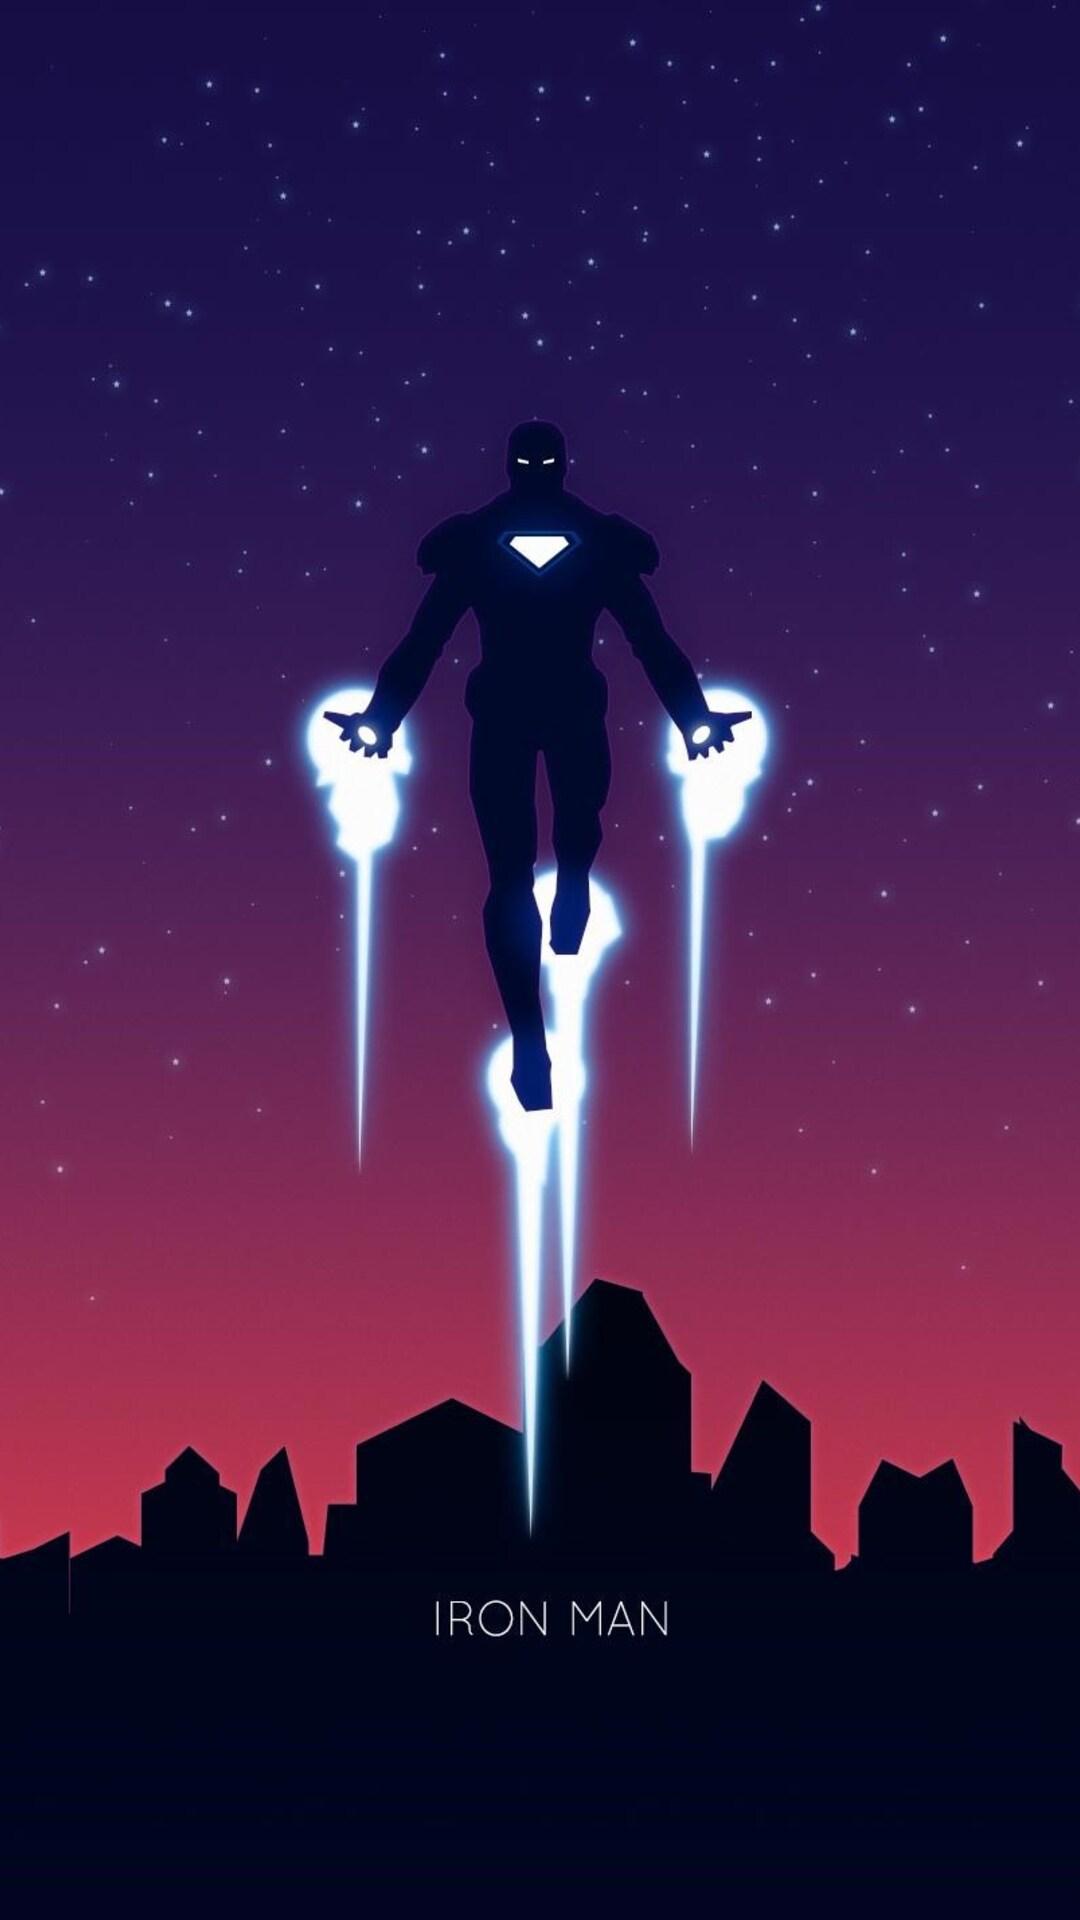 3d Thor Ragnarok Android Wallpaper 1080x1920 Iron Man Minimalism 2 Iphone 7 6s 6 Plus Pixel